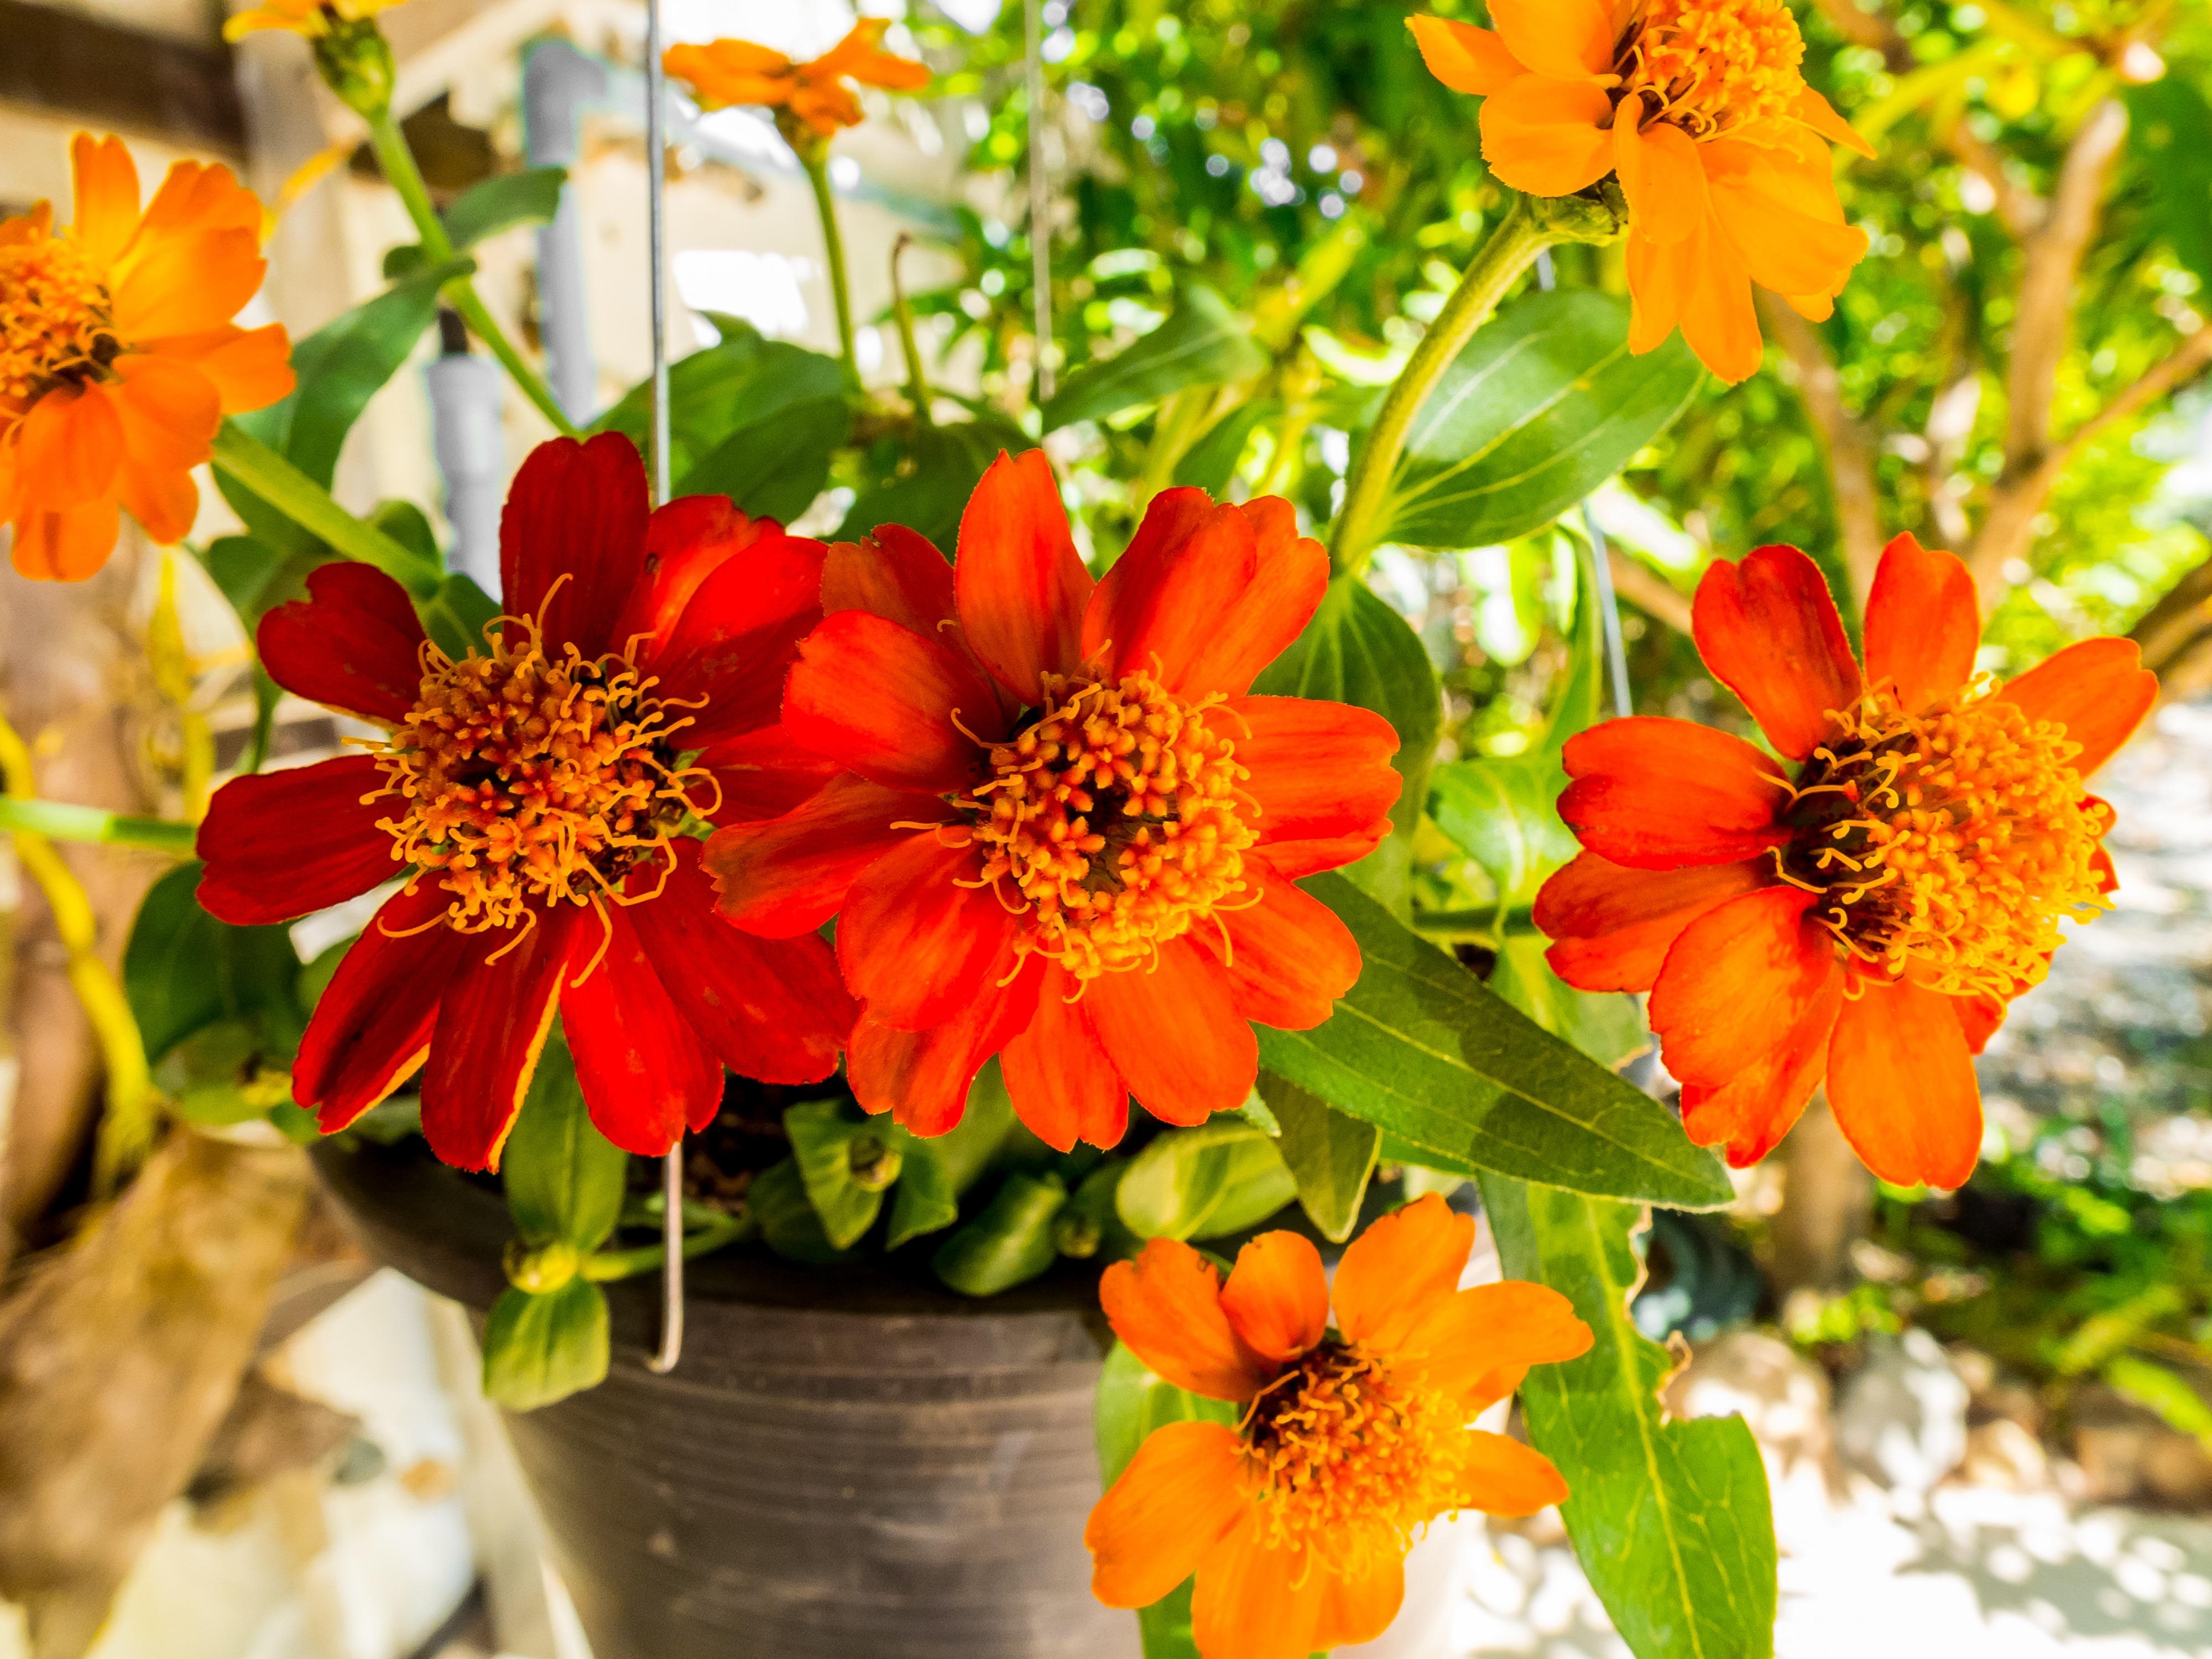 Free Images Leaf Petal Orange Red Autumn Botany Yellow